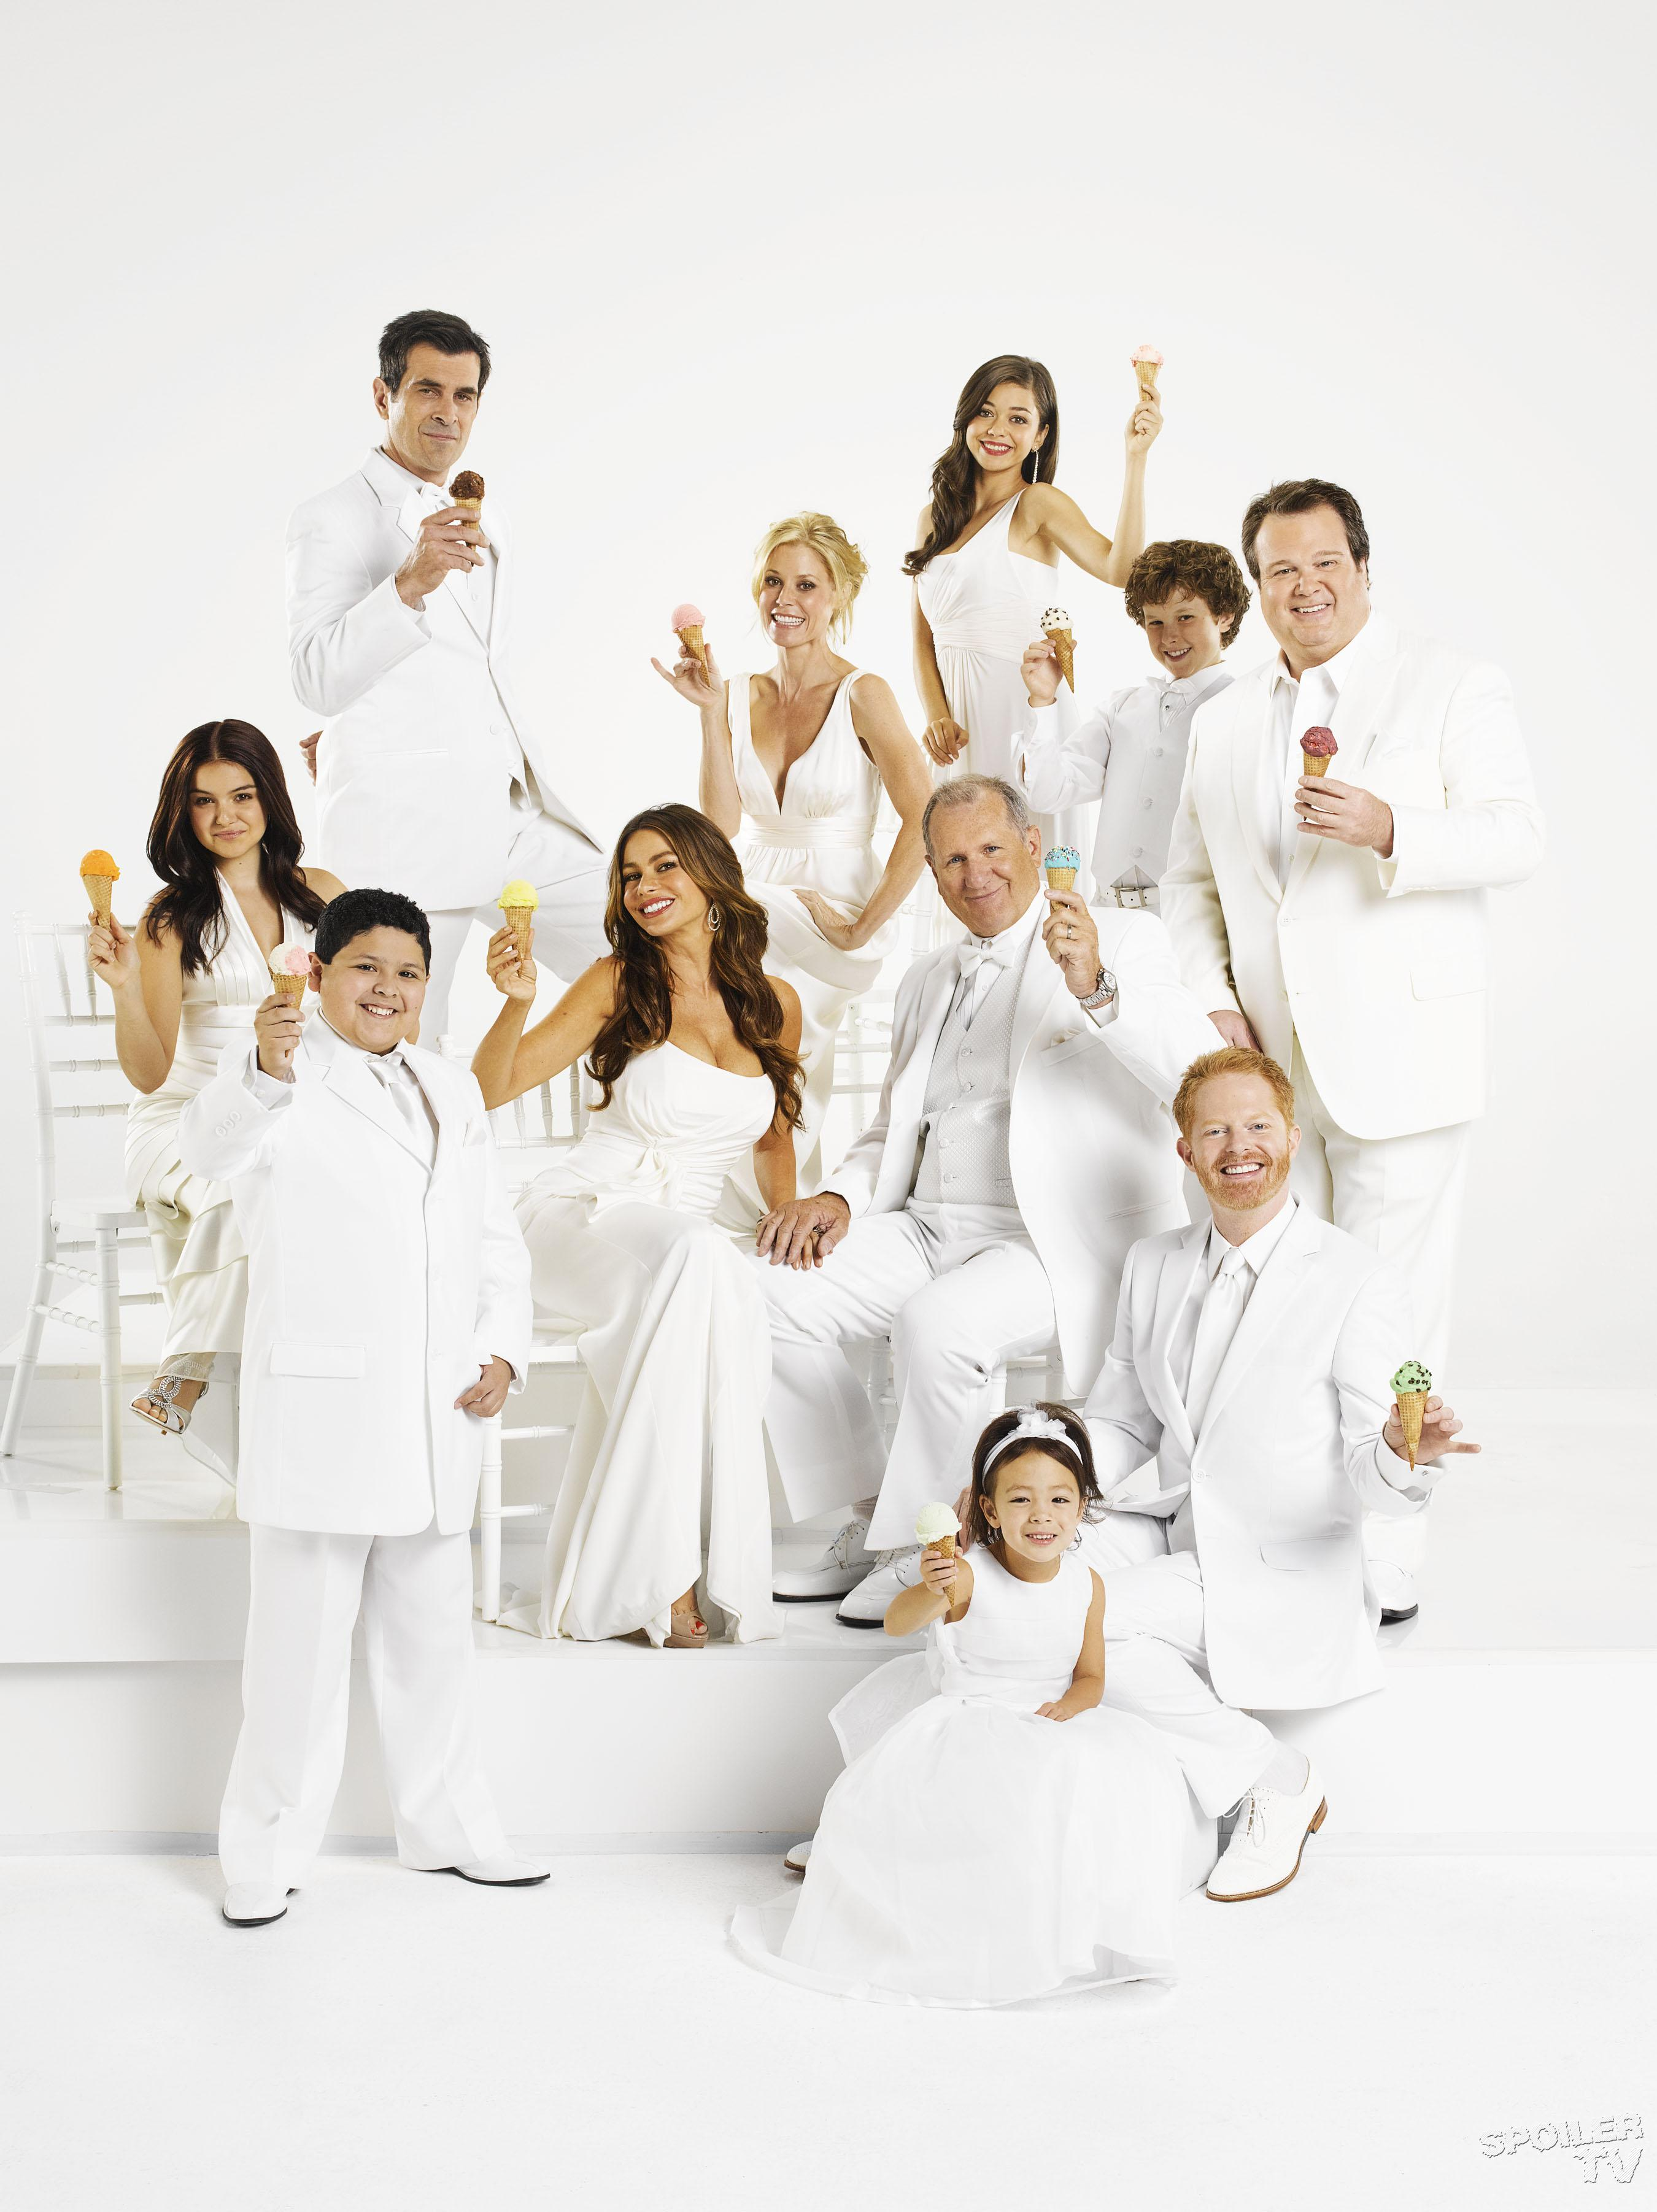 season 3 cast6 modern family photo 37540922 fanpop